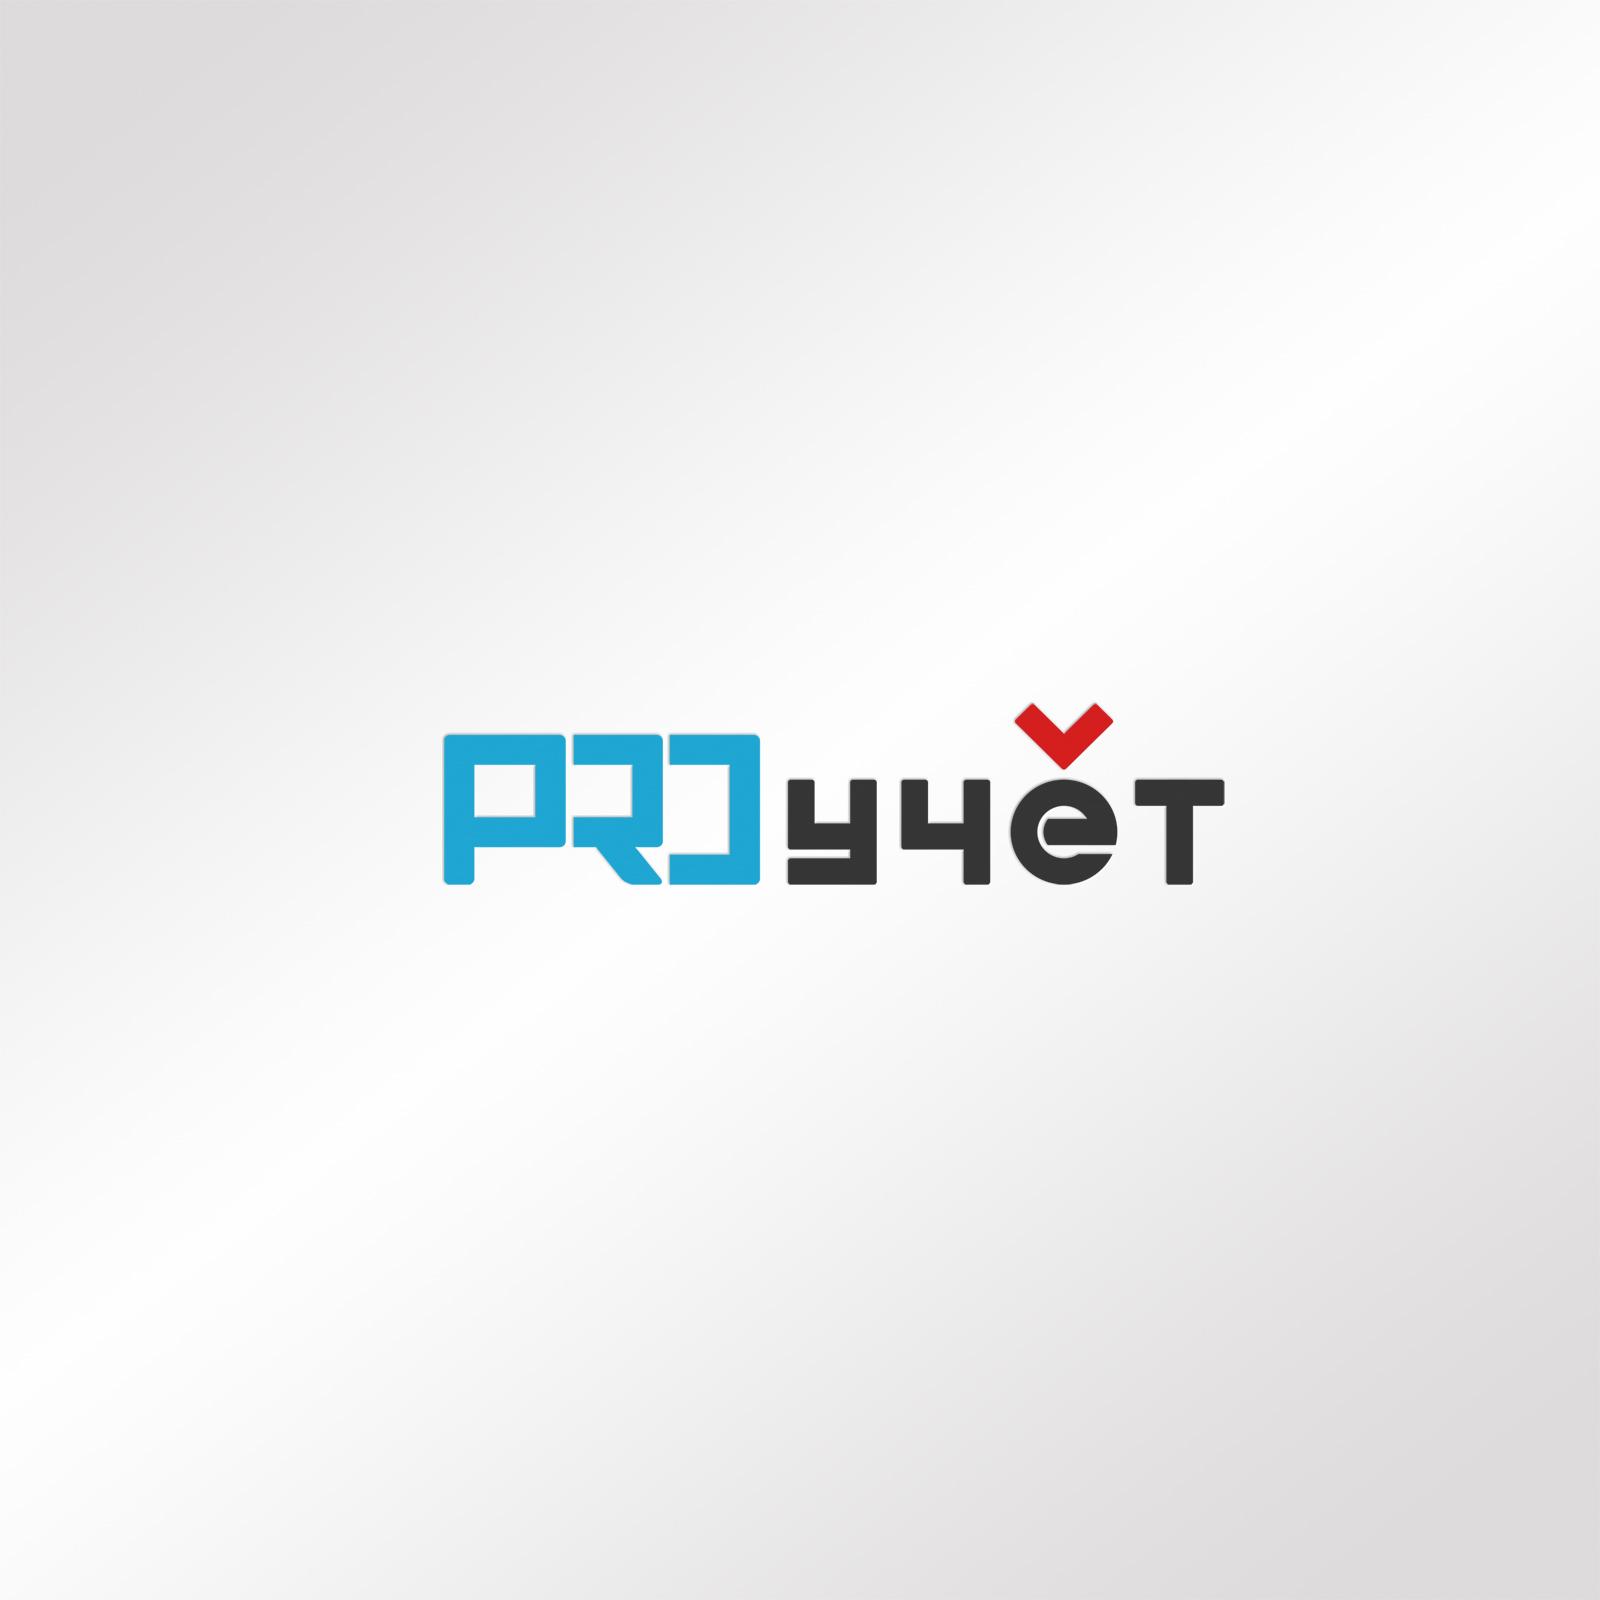 Разработка логотипа с фирменным знаком для Бухгалтерской ком фото f_2925f9bcda0ac4bb.jpg